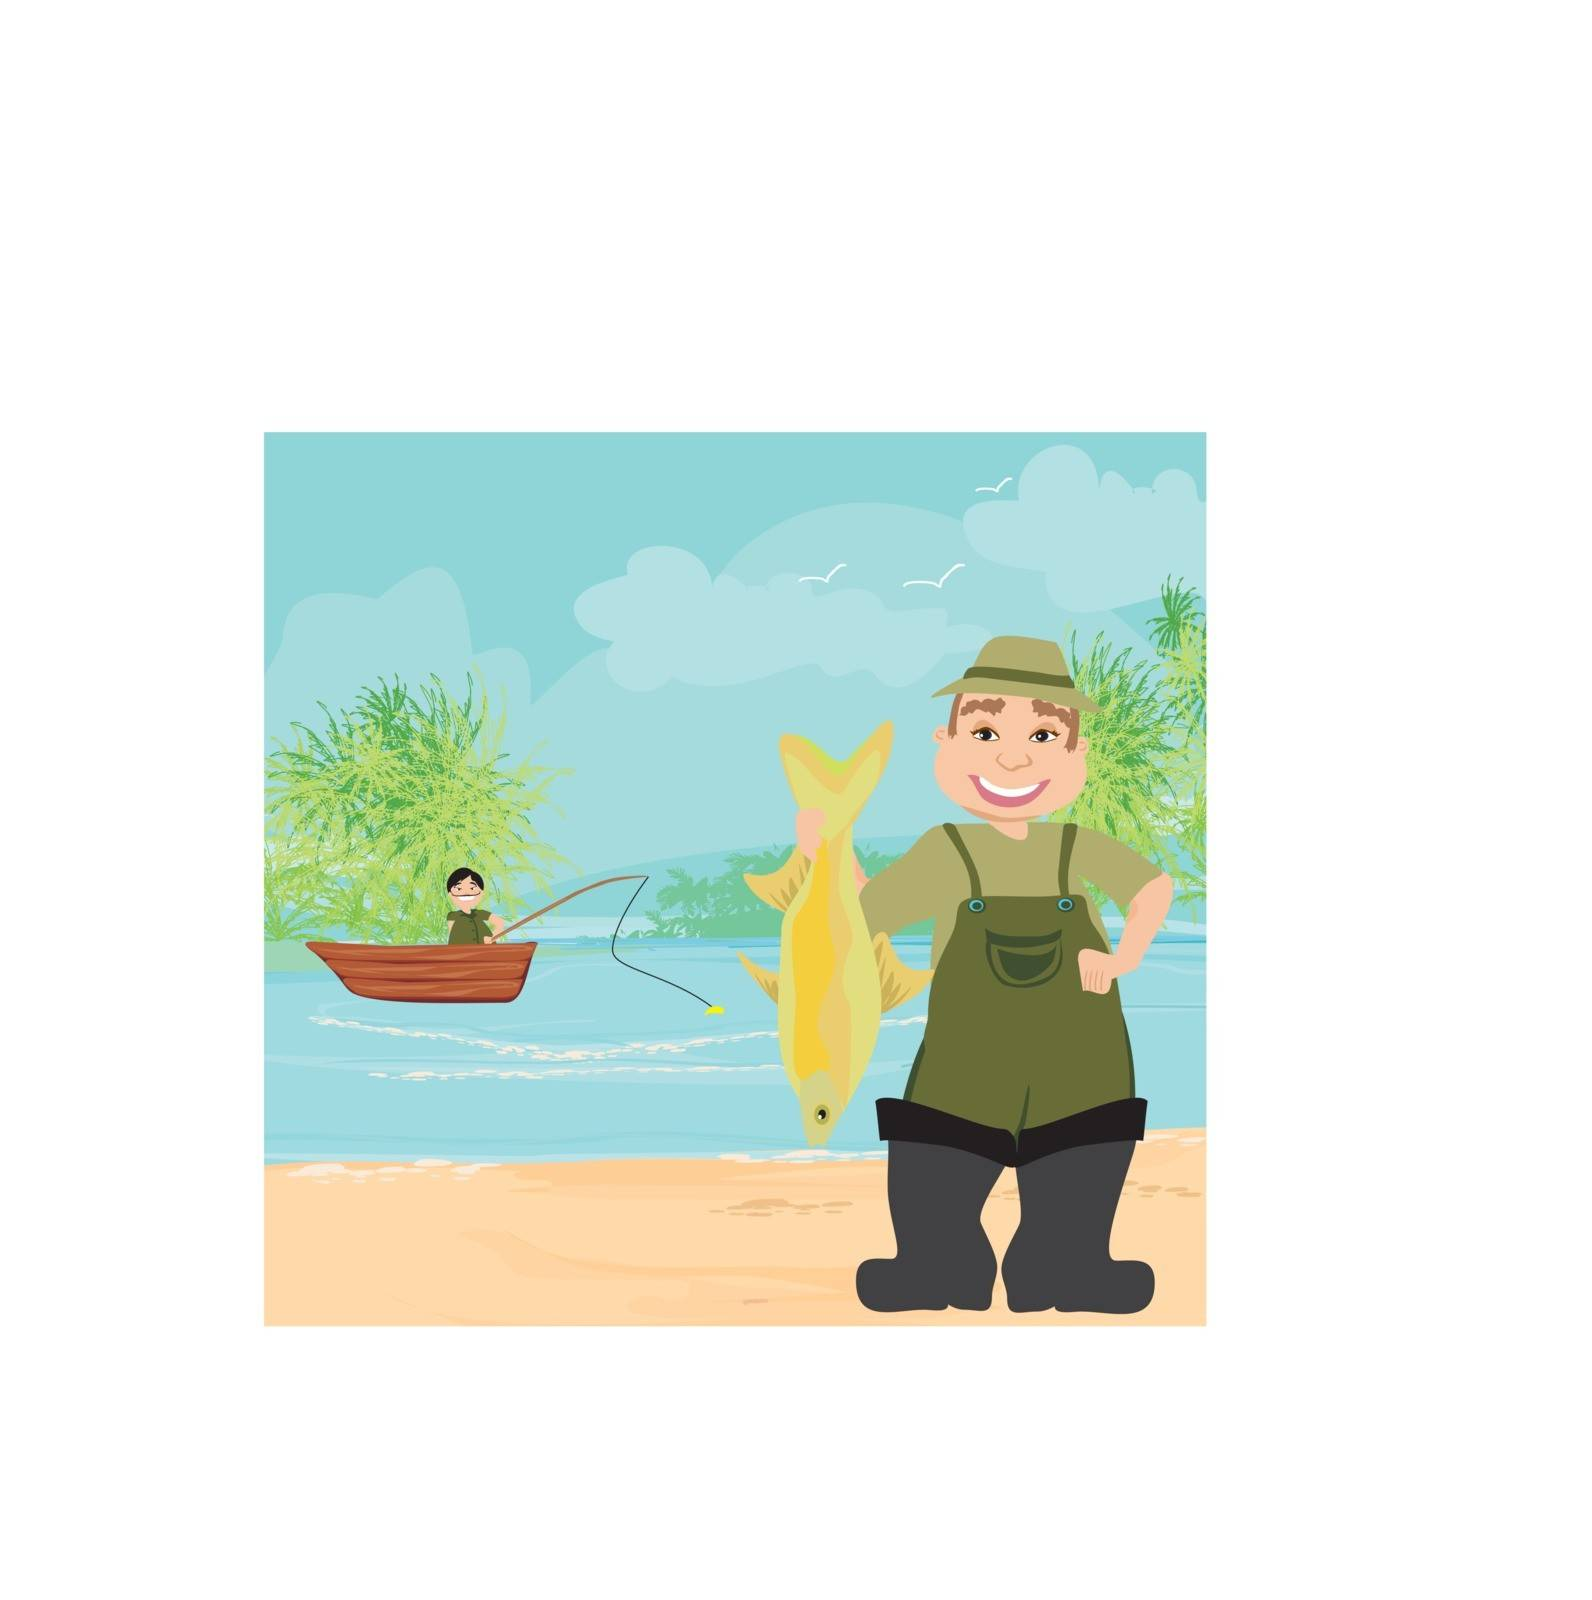 fisherman and fishing boat